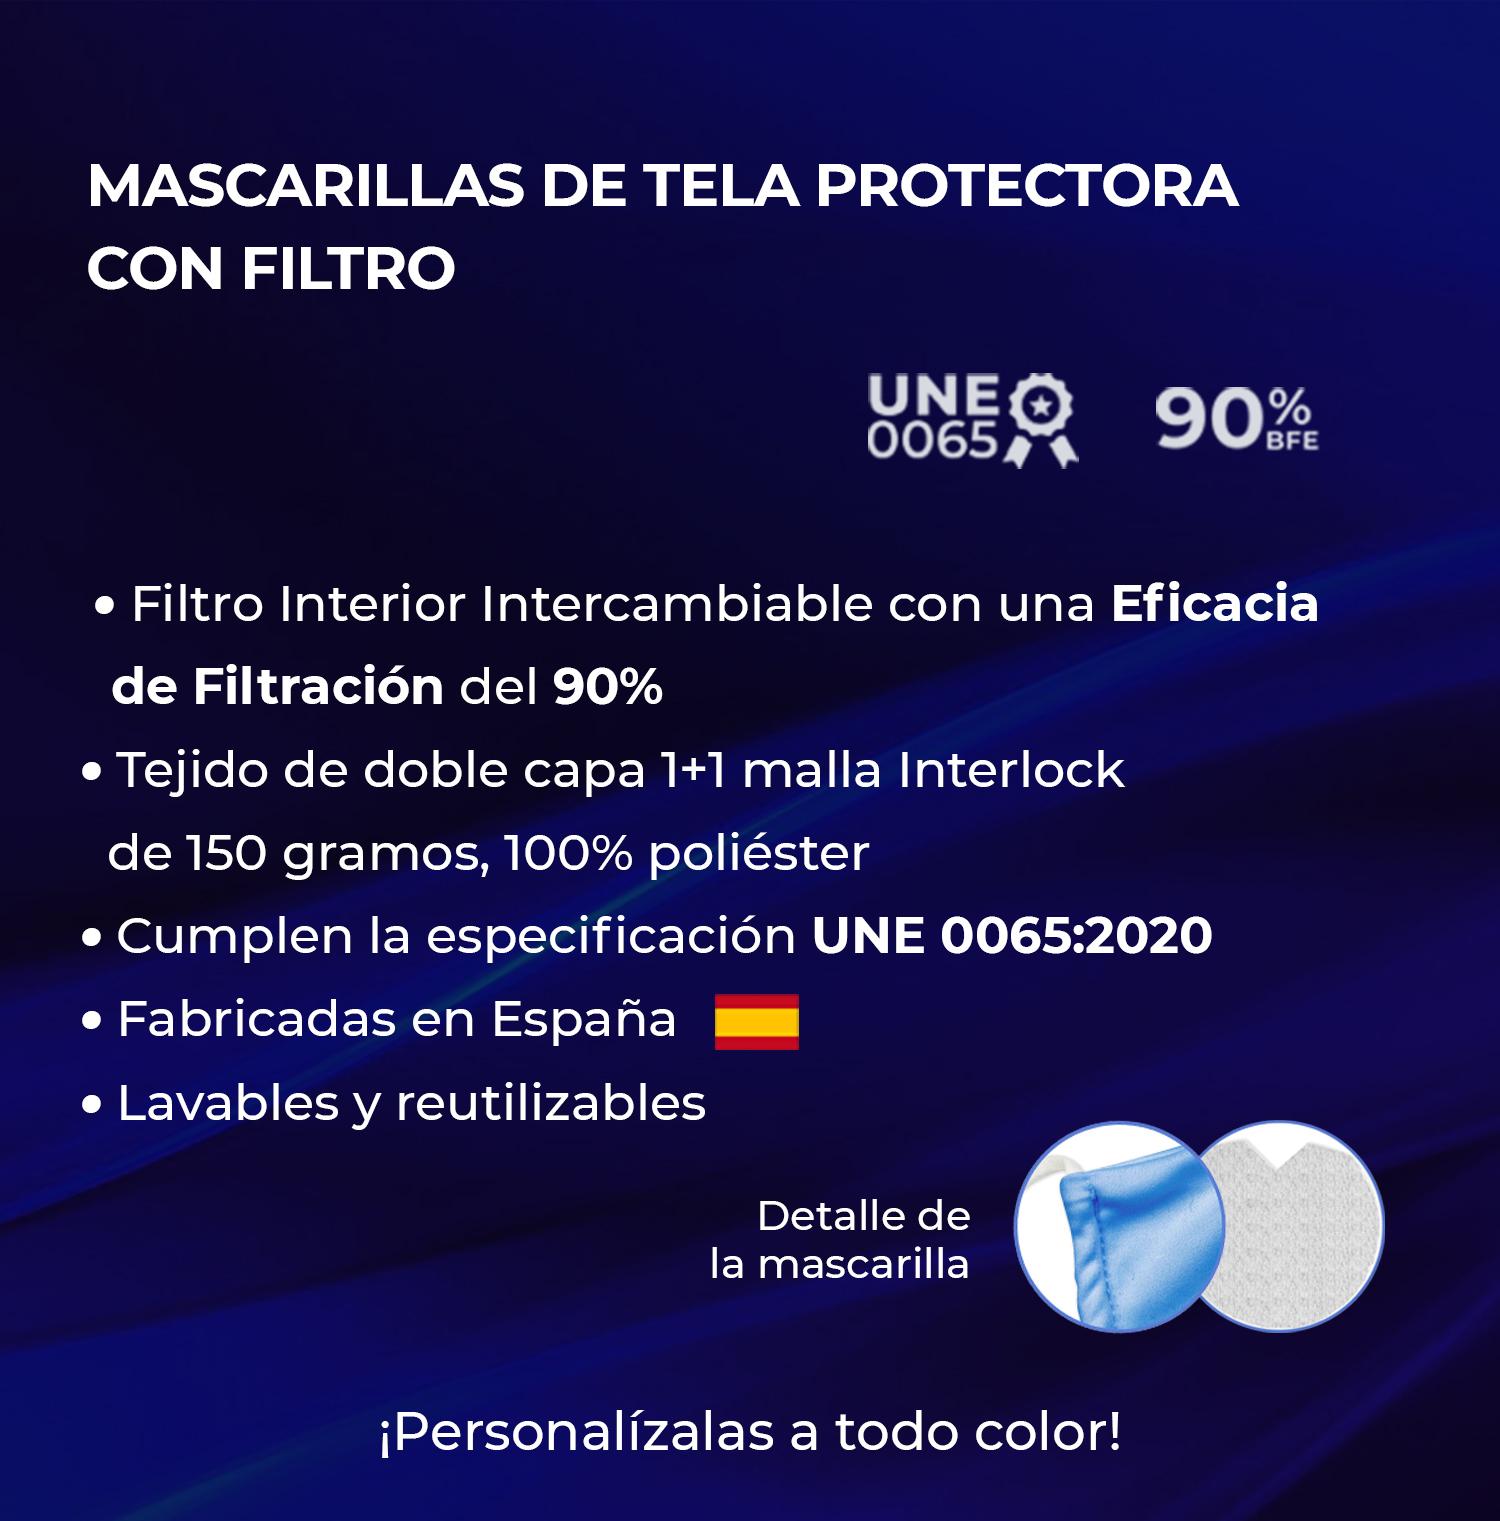 Mascarilla de tela protectora reutilizable para niño CON FILTRO